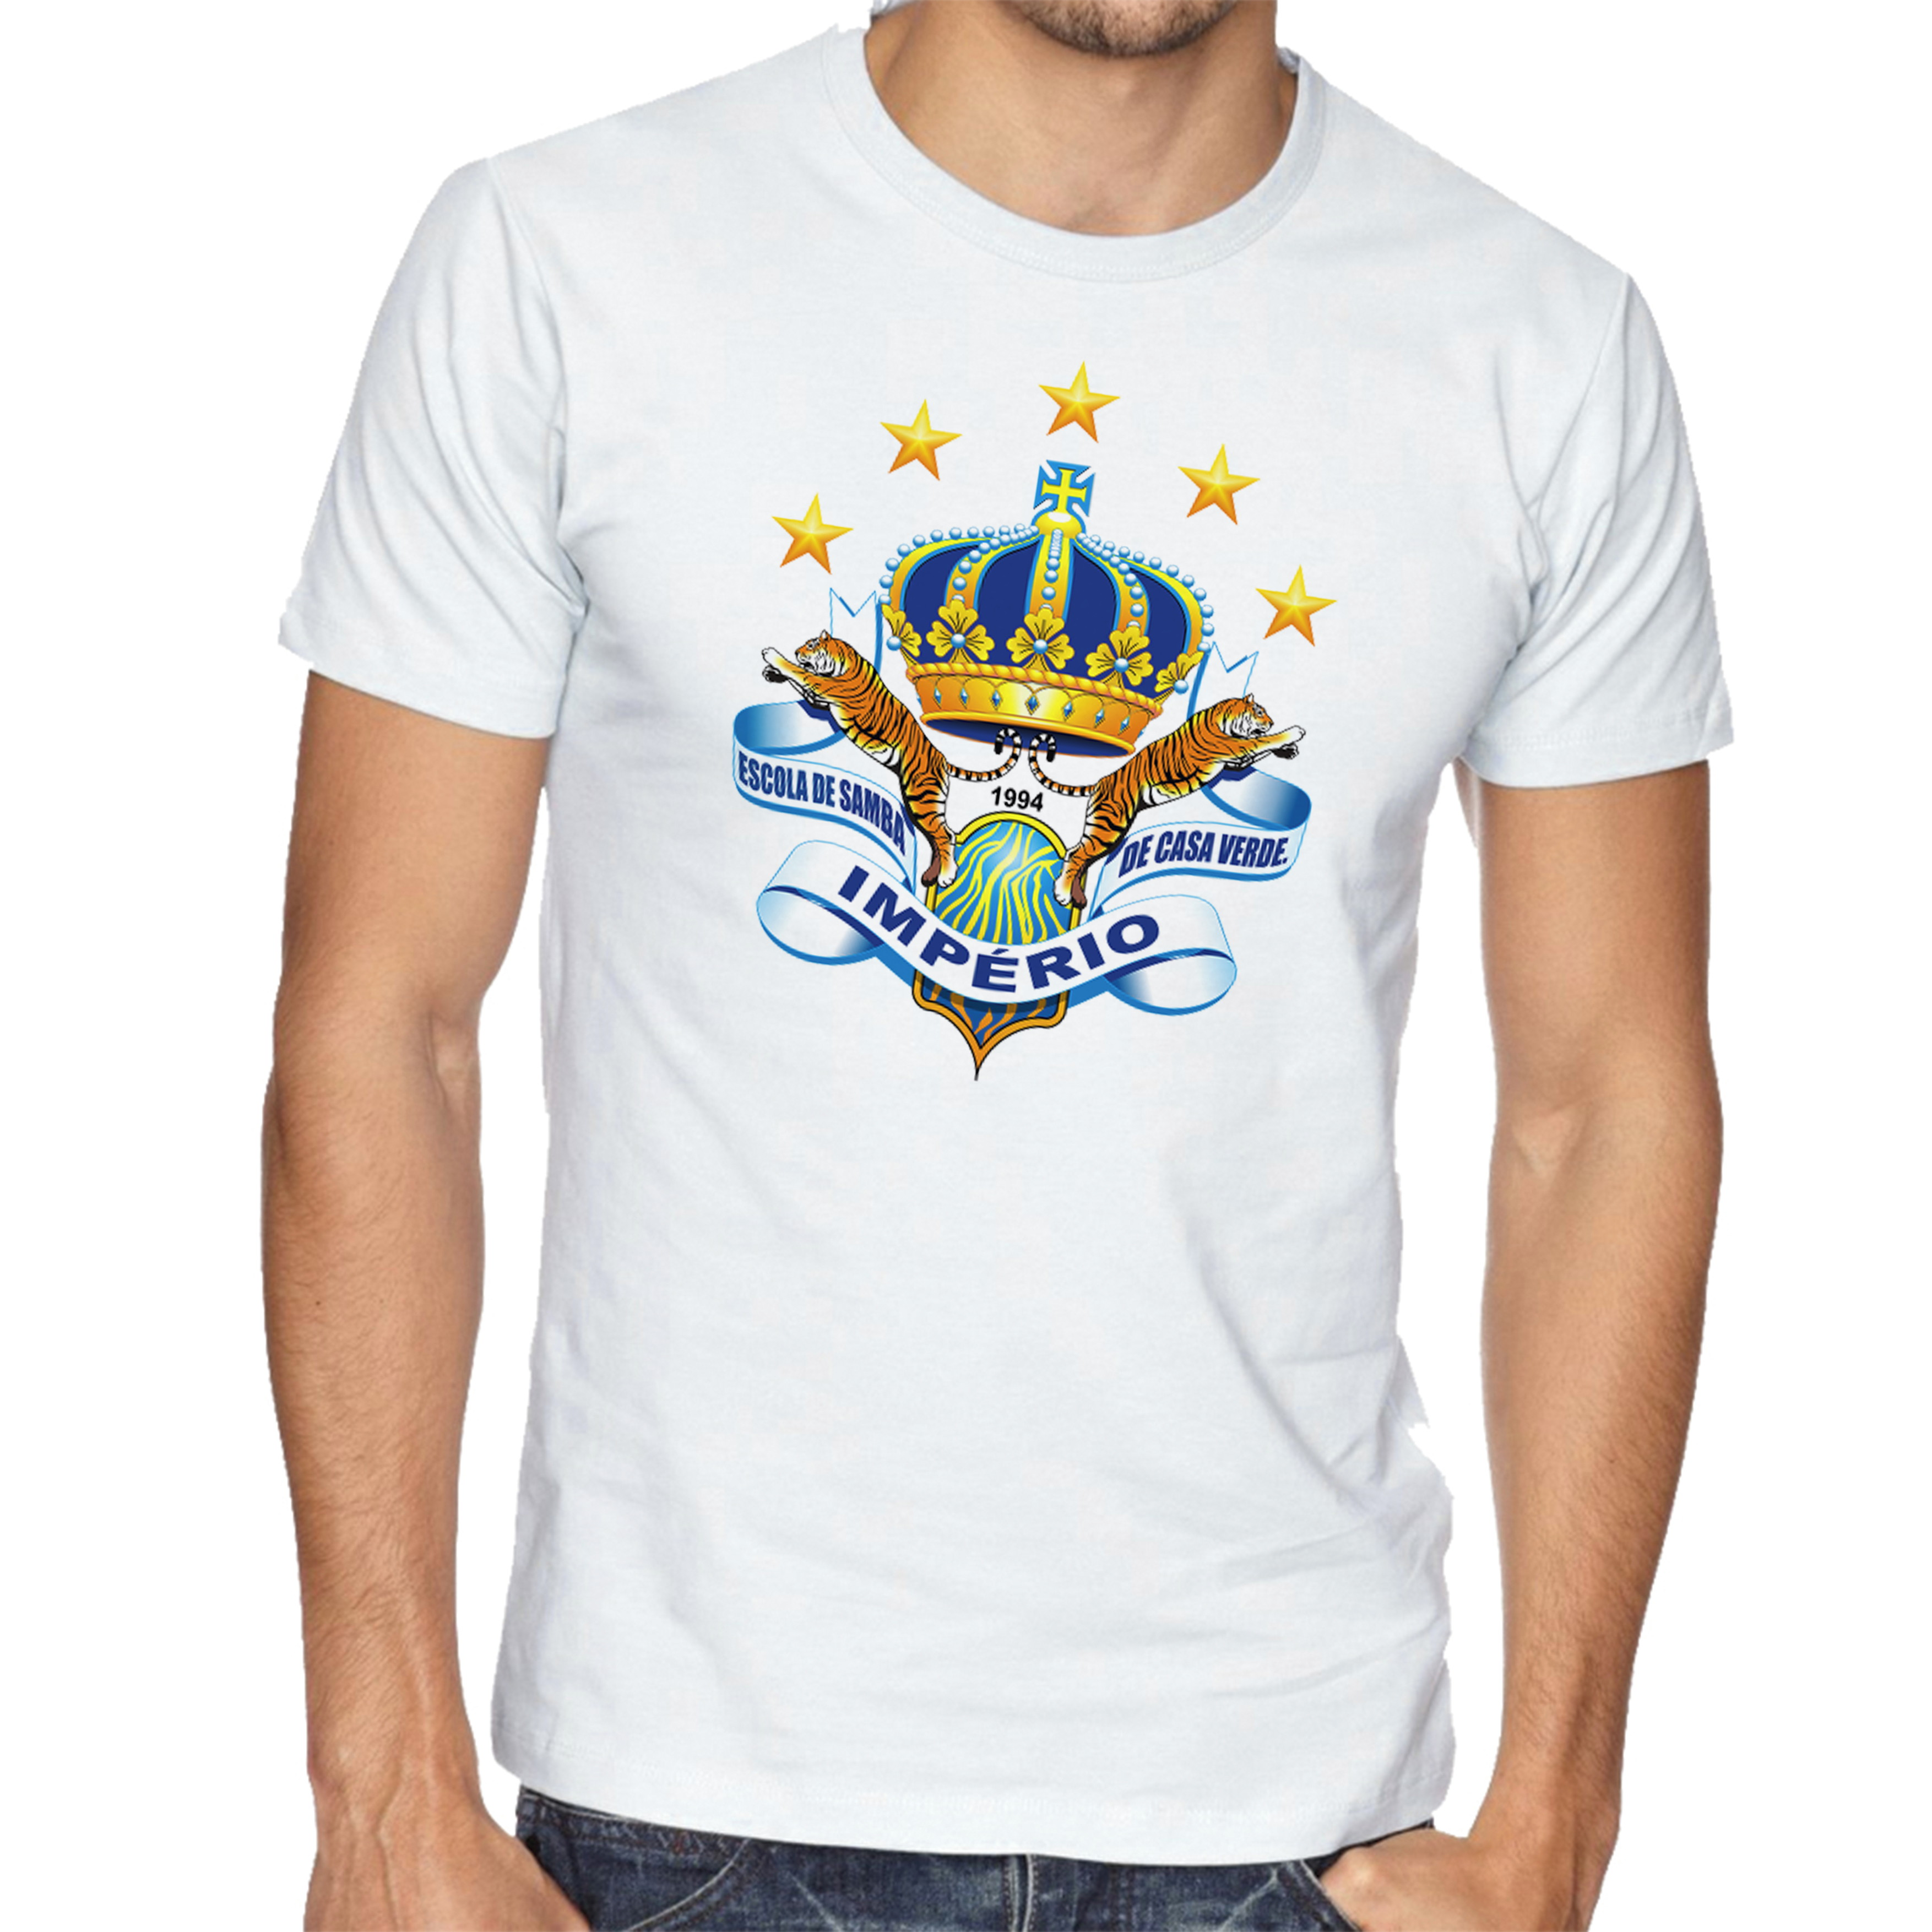 43fad41f3 Camisa Personalizada Império Serrano